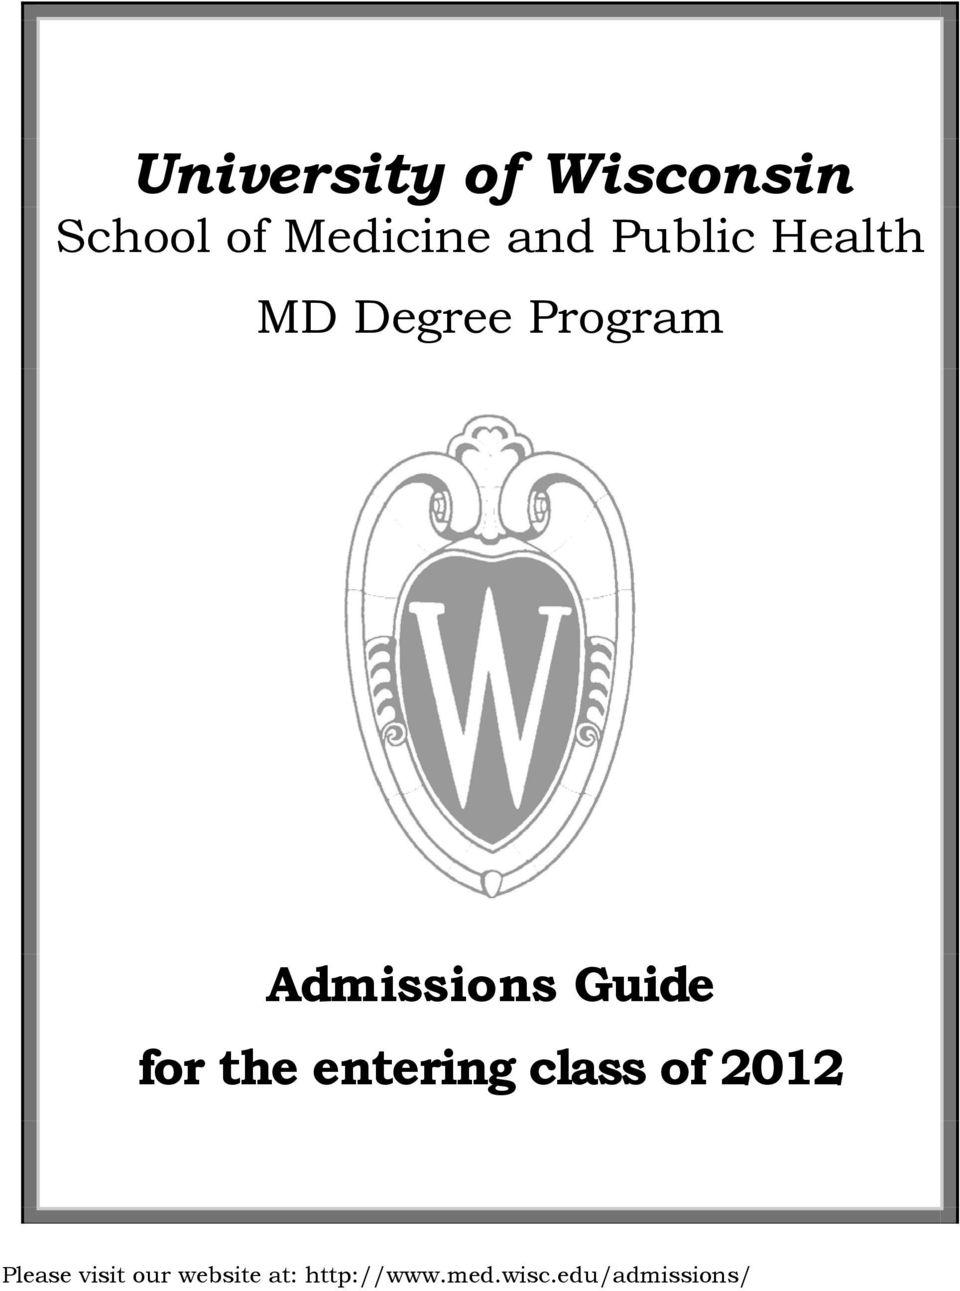 University of Wisconsin School of Medicine and Public